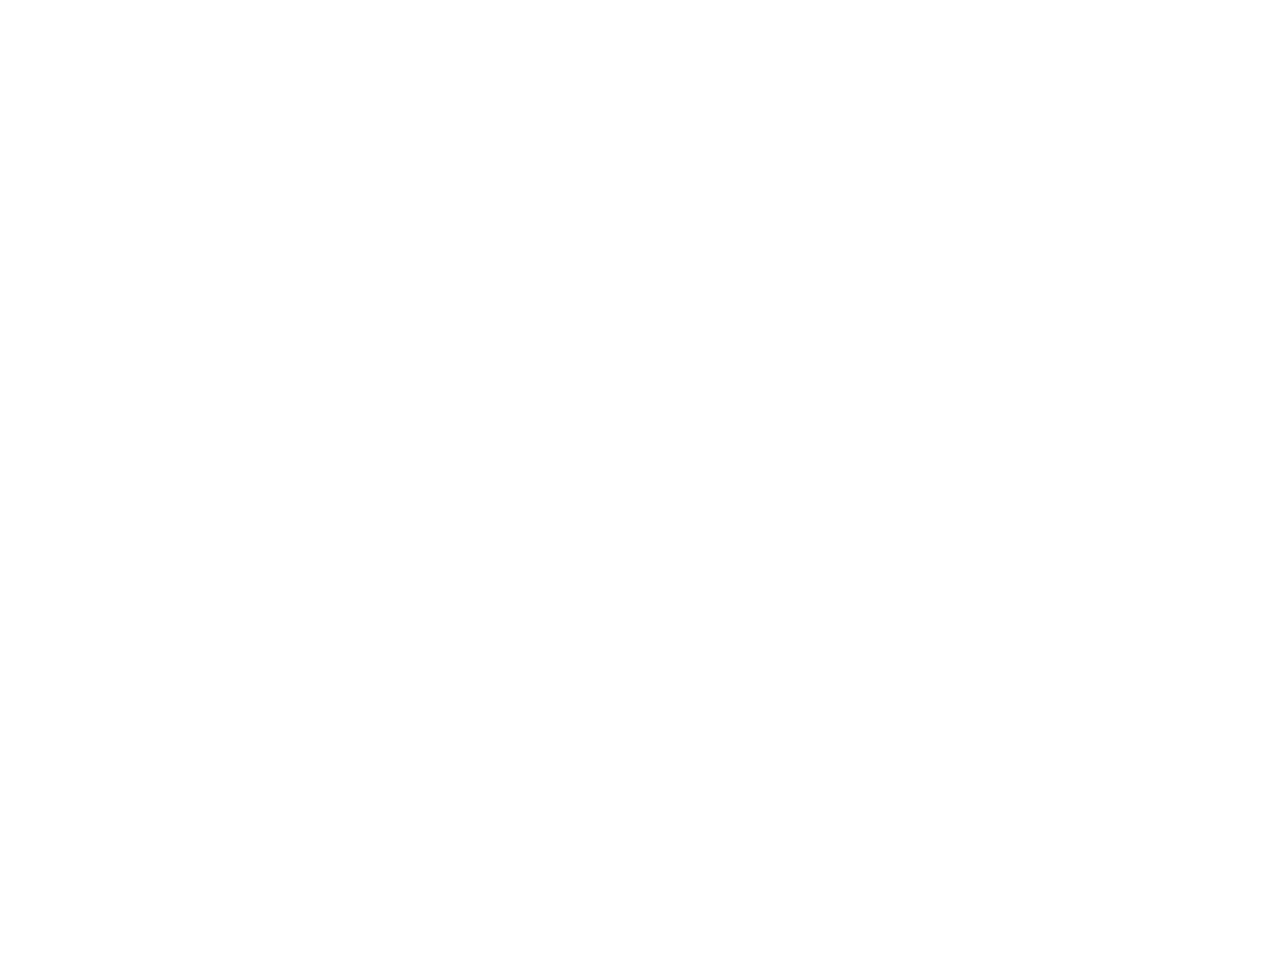 Best Website Development Services in India & USA | Custom Web App Development Services